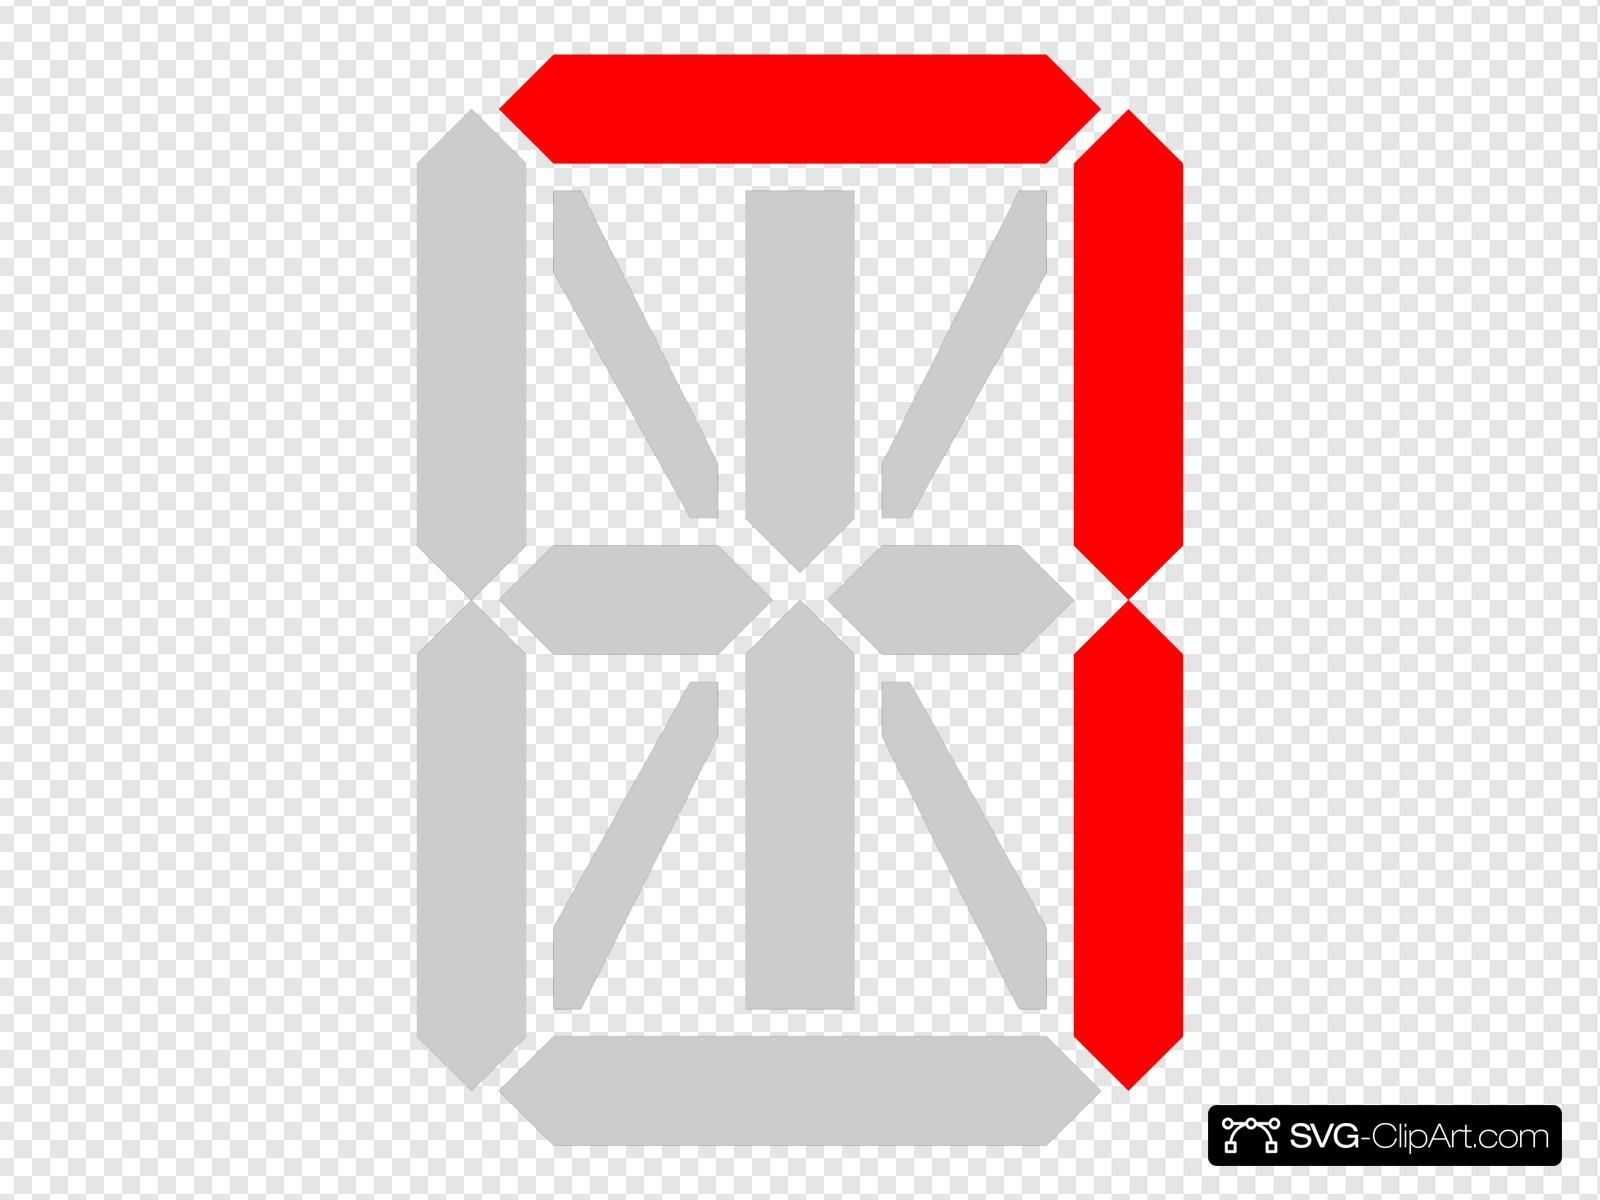 Segment Display Clip art, Icon and SVG - SVG Clipart